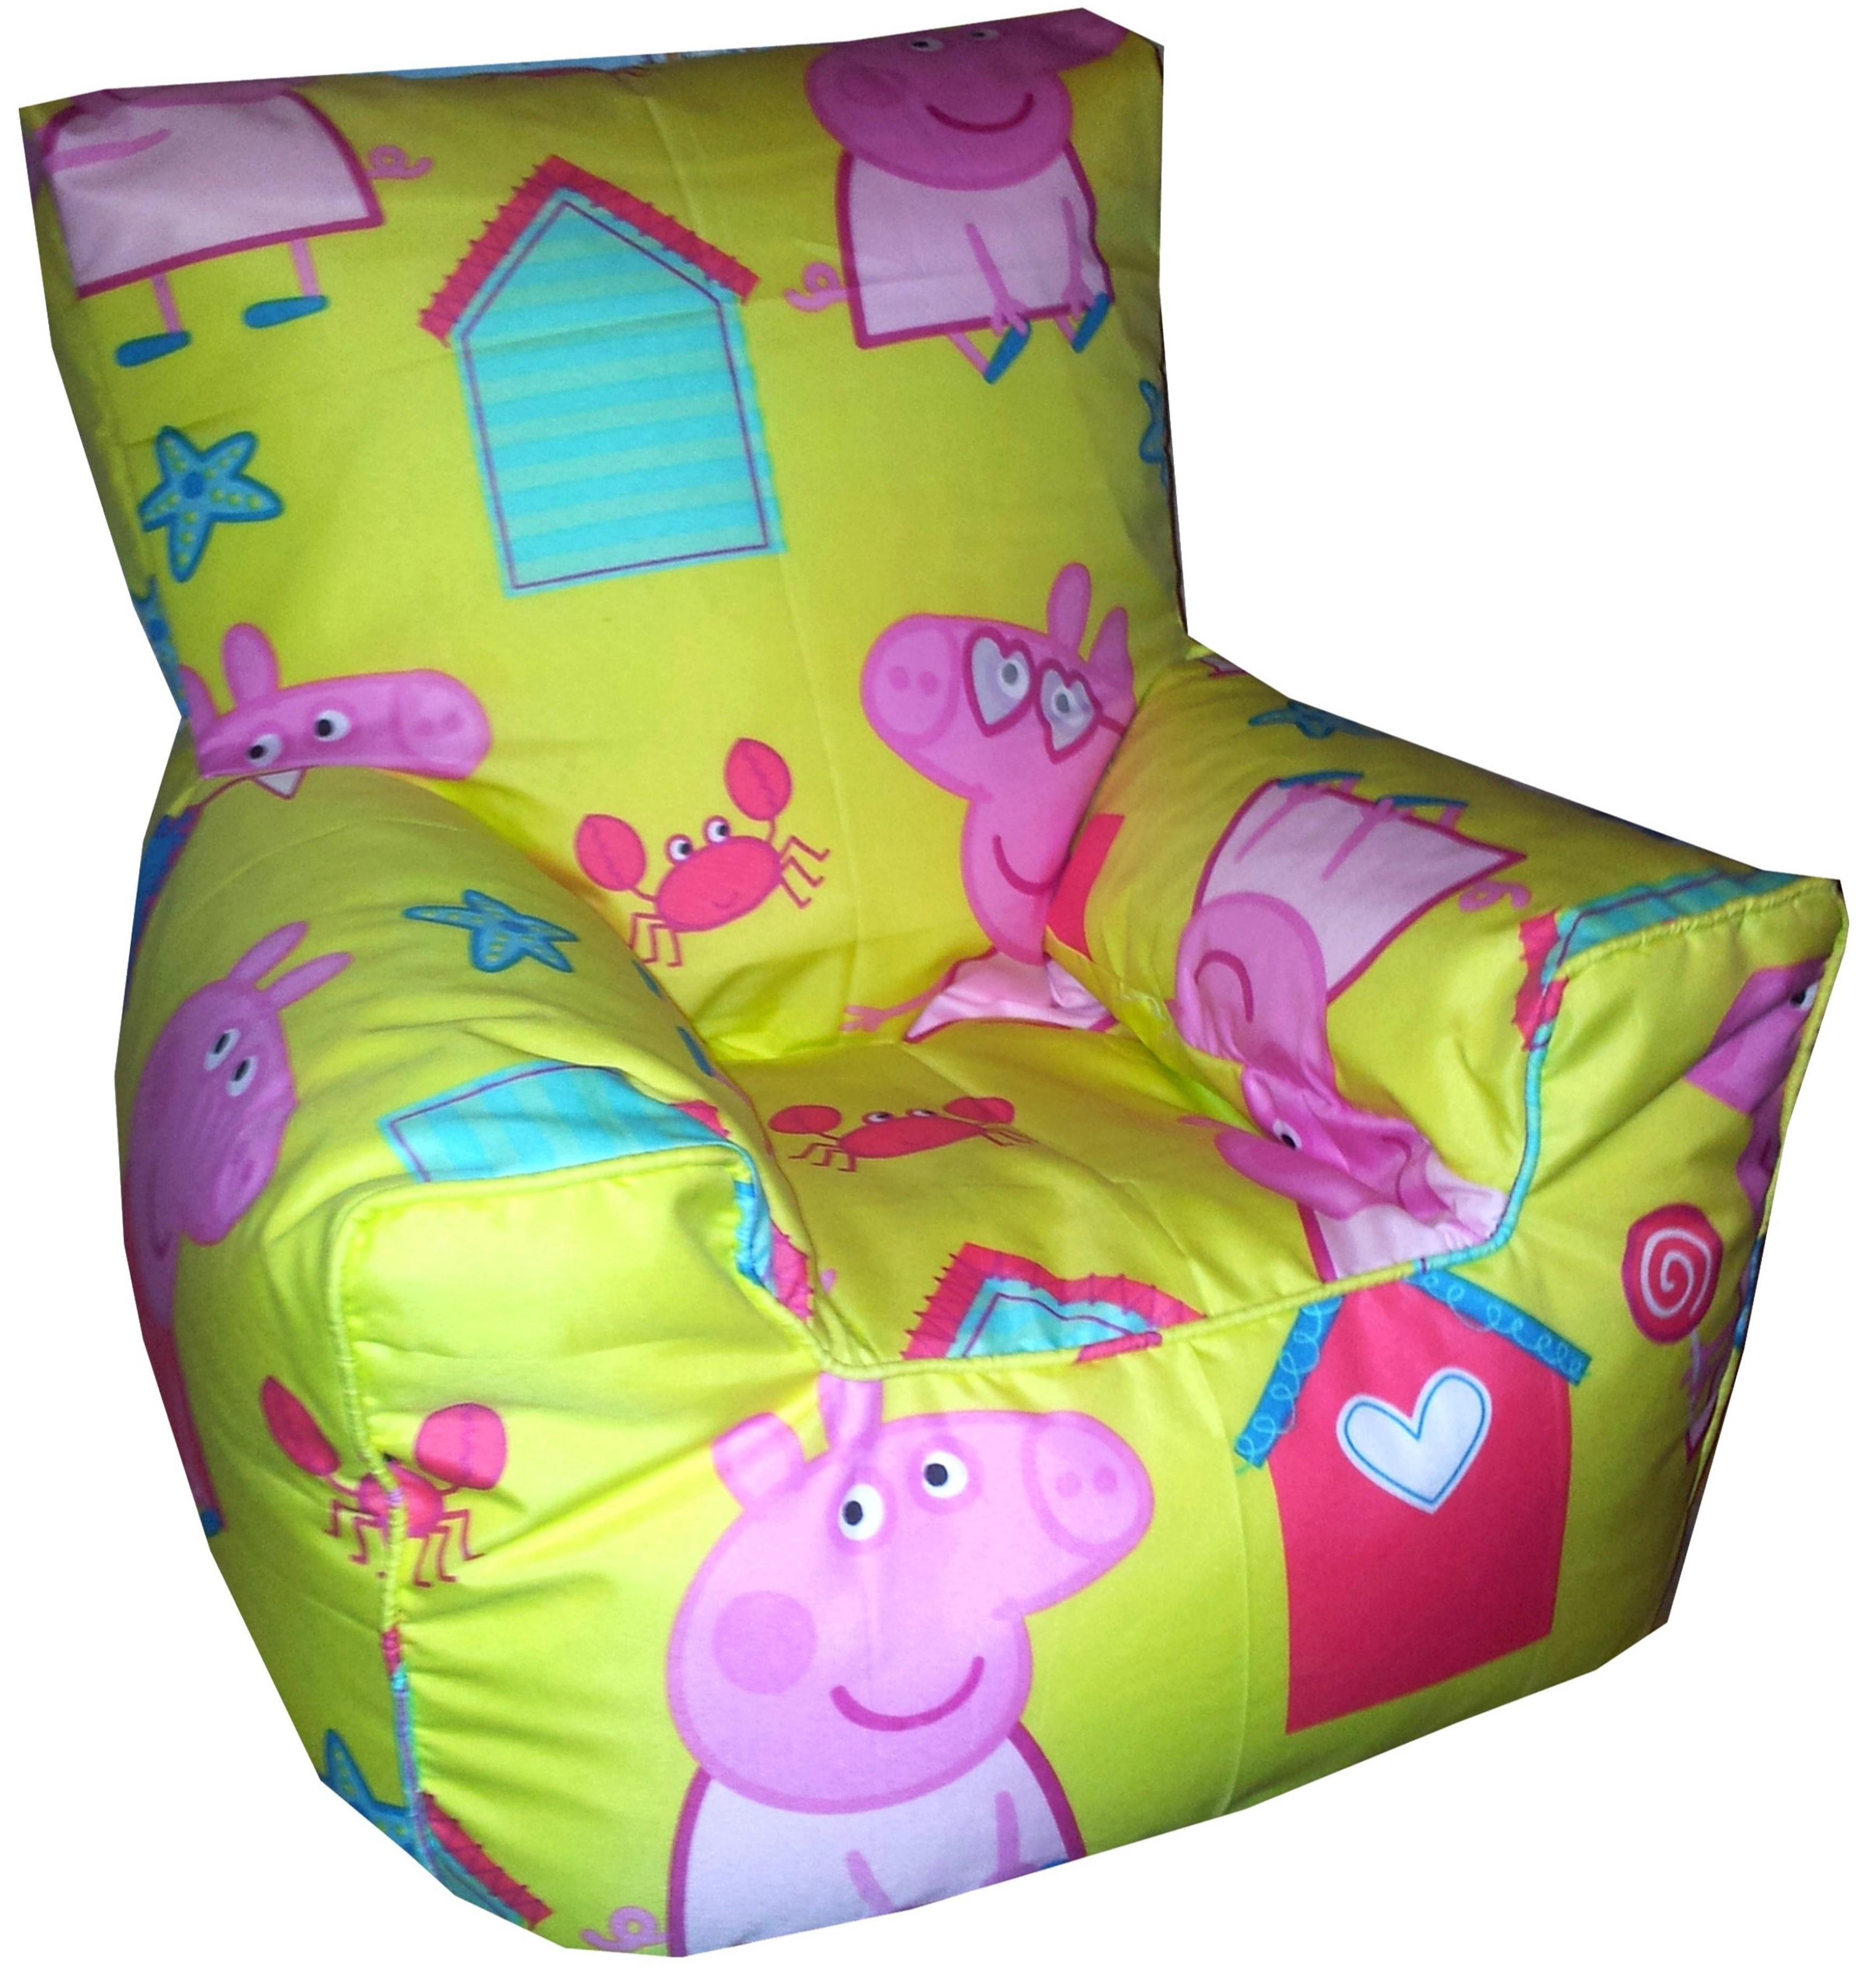 Awe Inspiring Childrens Bean Bags Bean Bag Chairs Cushions Comfy Creativecarmelina Interior Chair Design Creativecarmelinacom